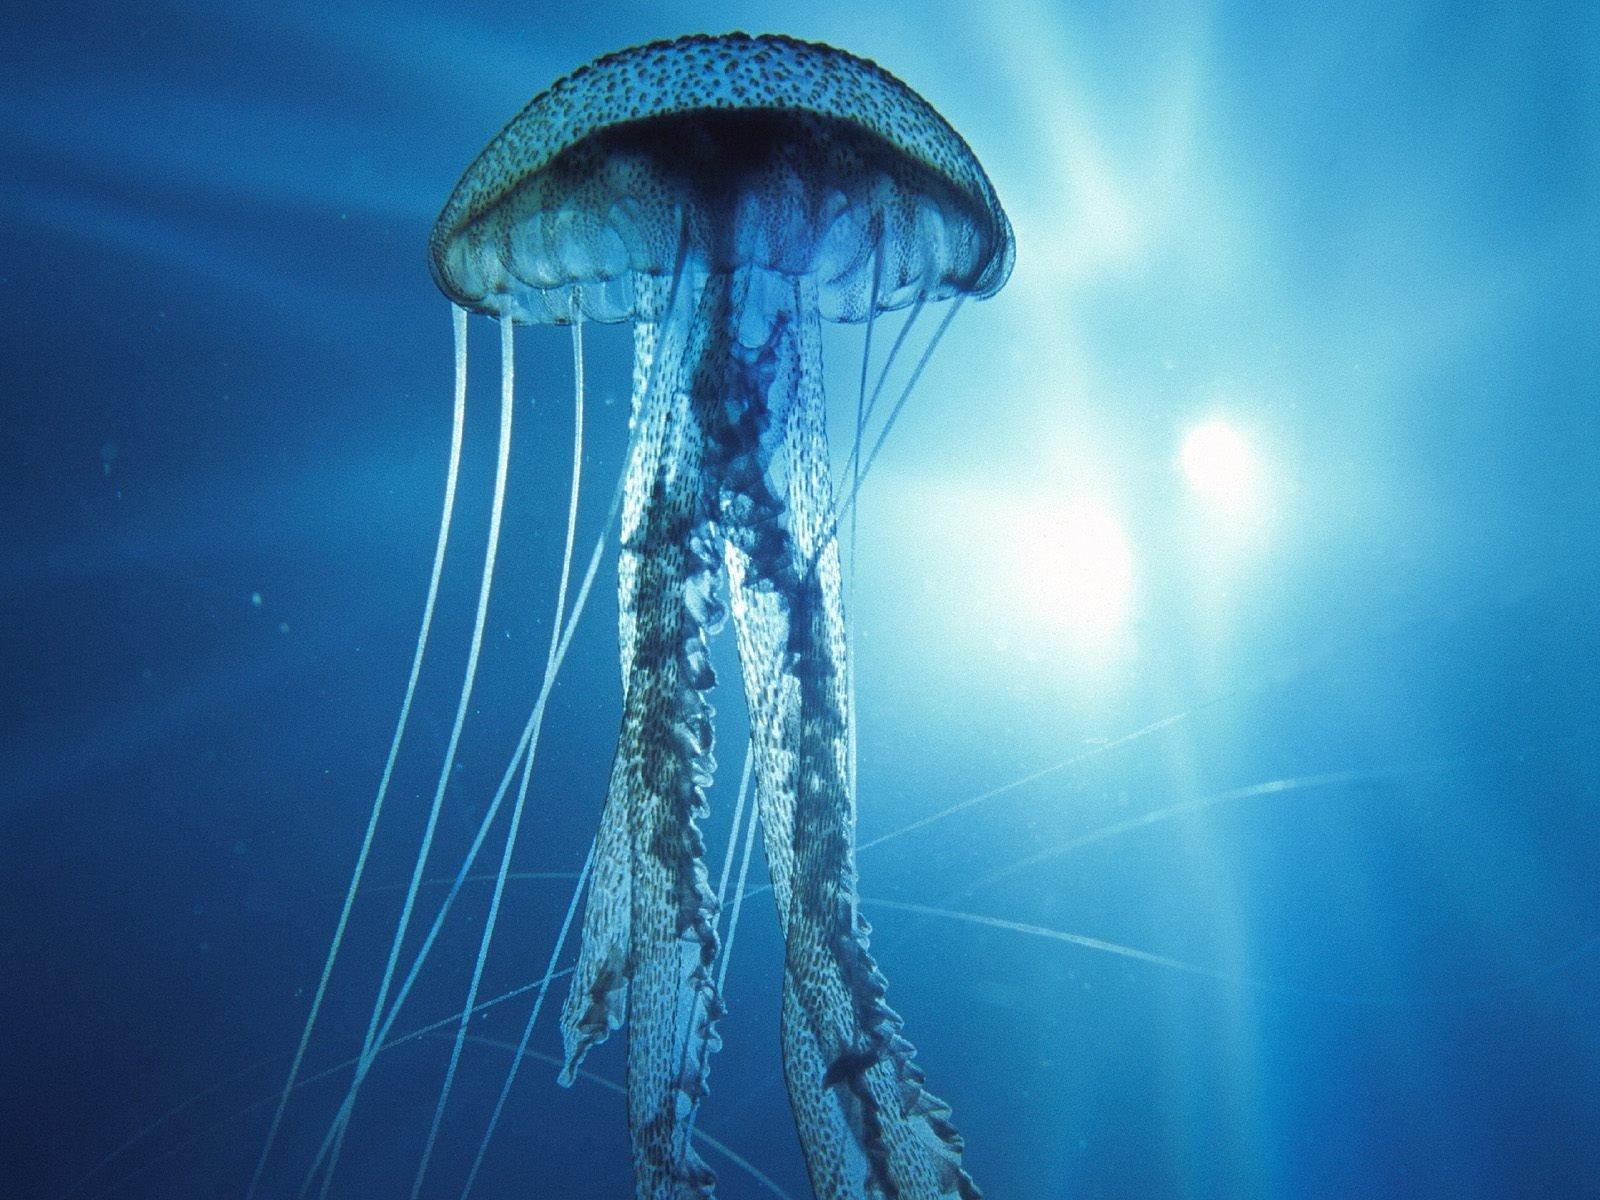 great Jellyfish Wallpaper